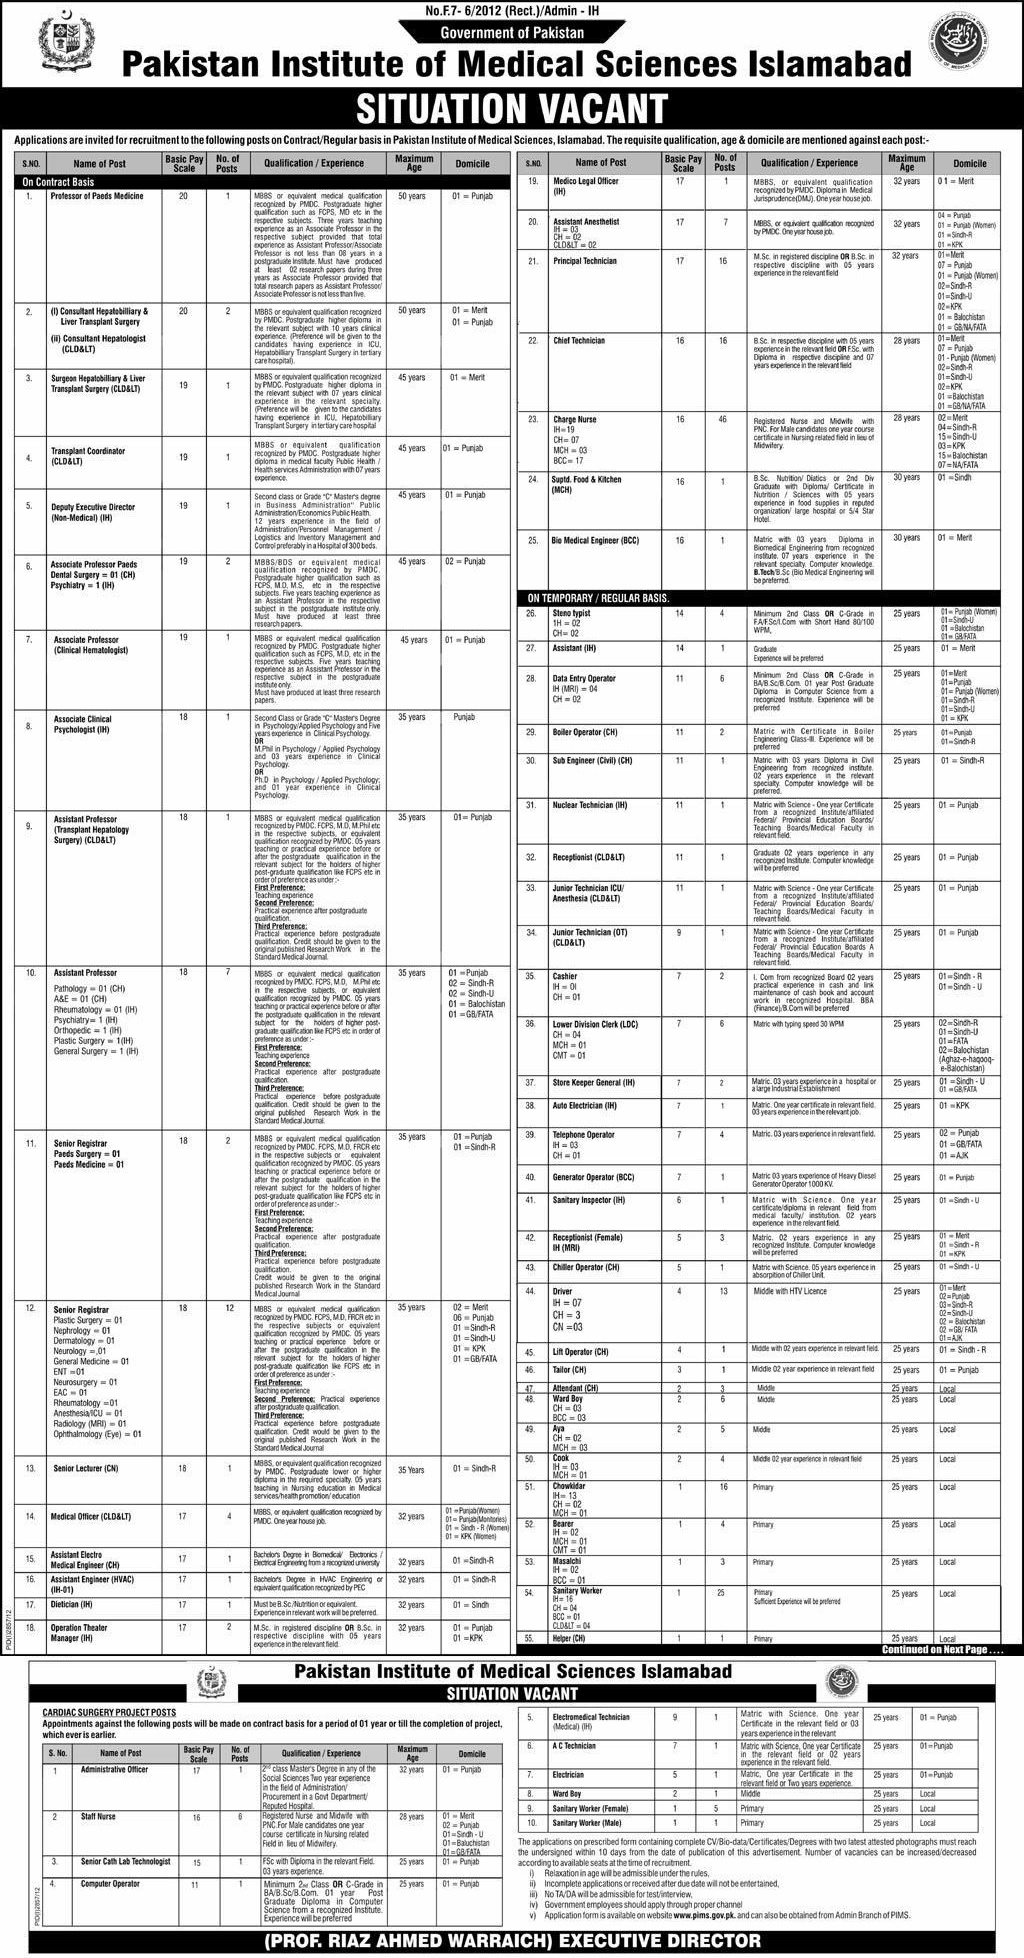 PIMS Hospital Islamabad Jobs 2012 December Application